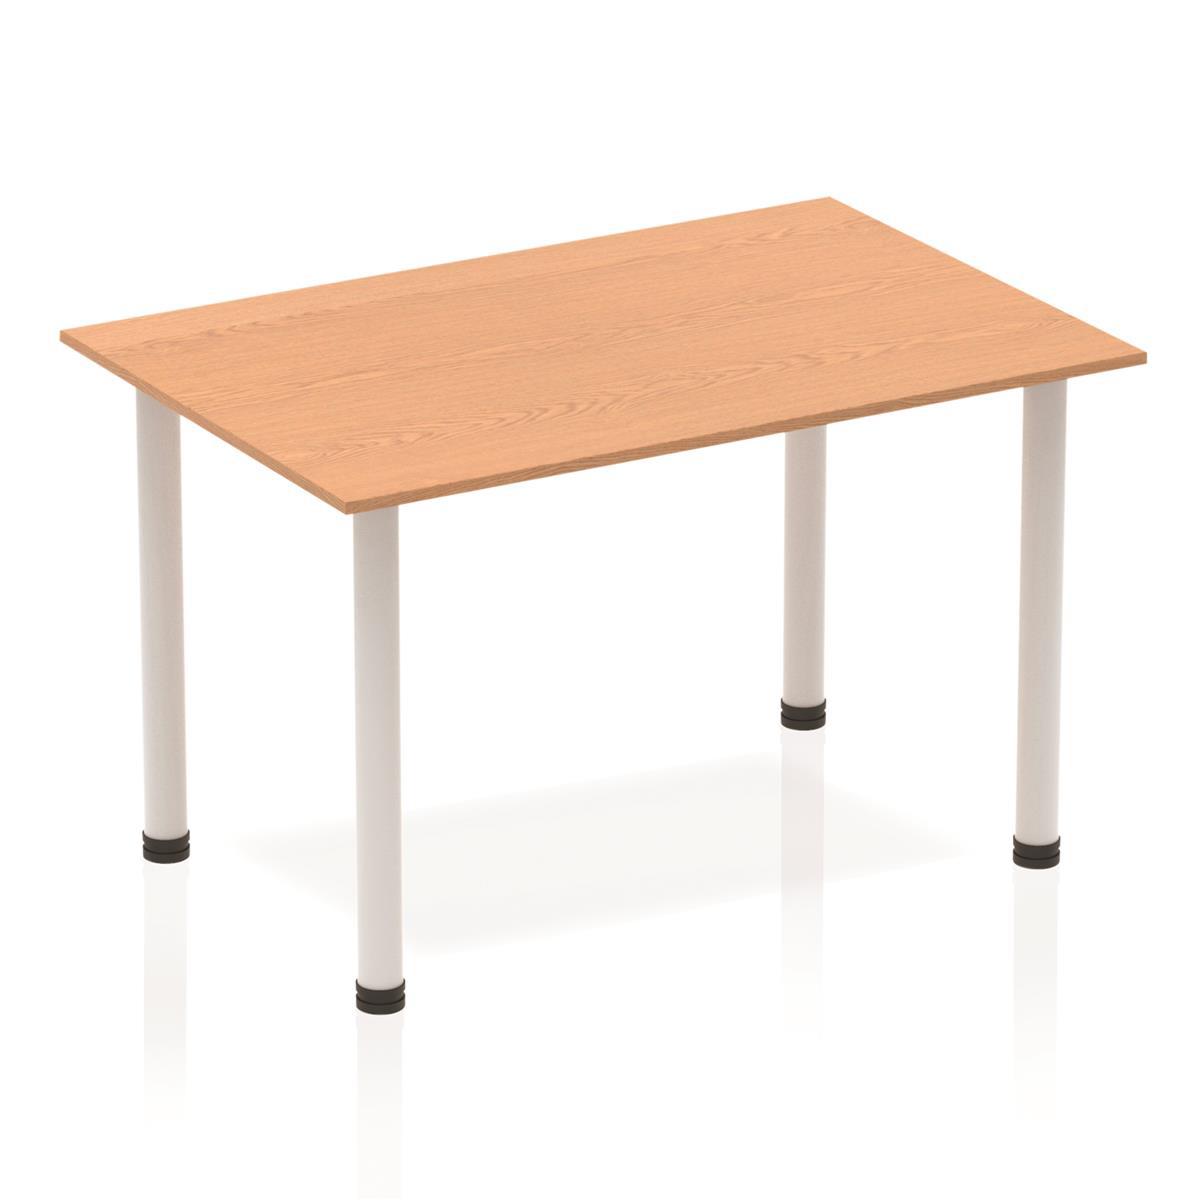 Sonix Rectangular Silver Post Leg Table 1200x800mm Oak Ref BF00178